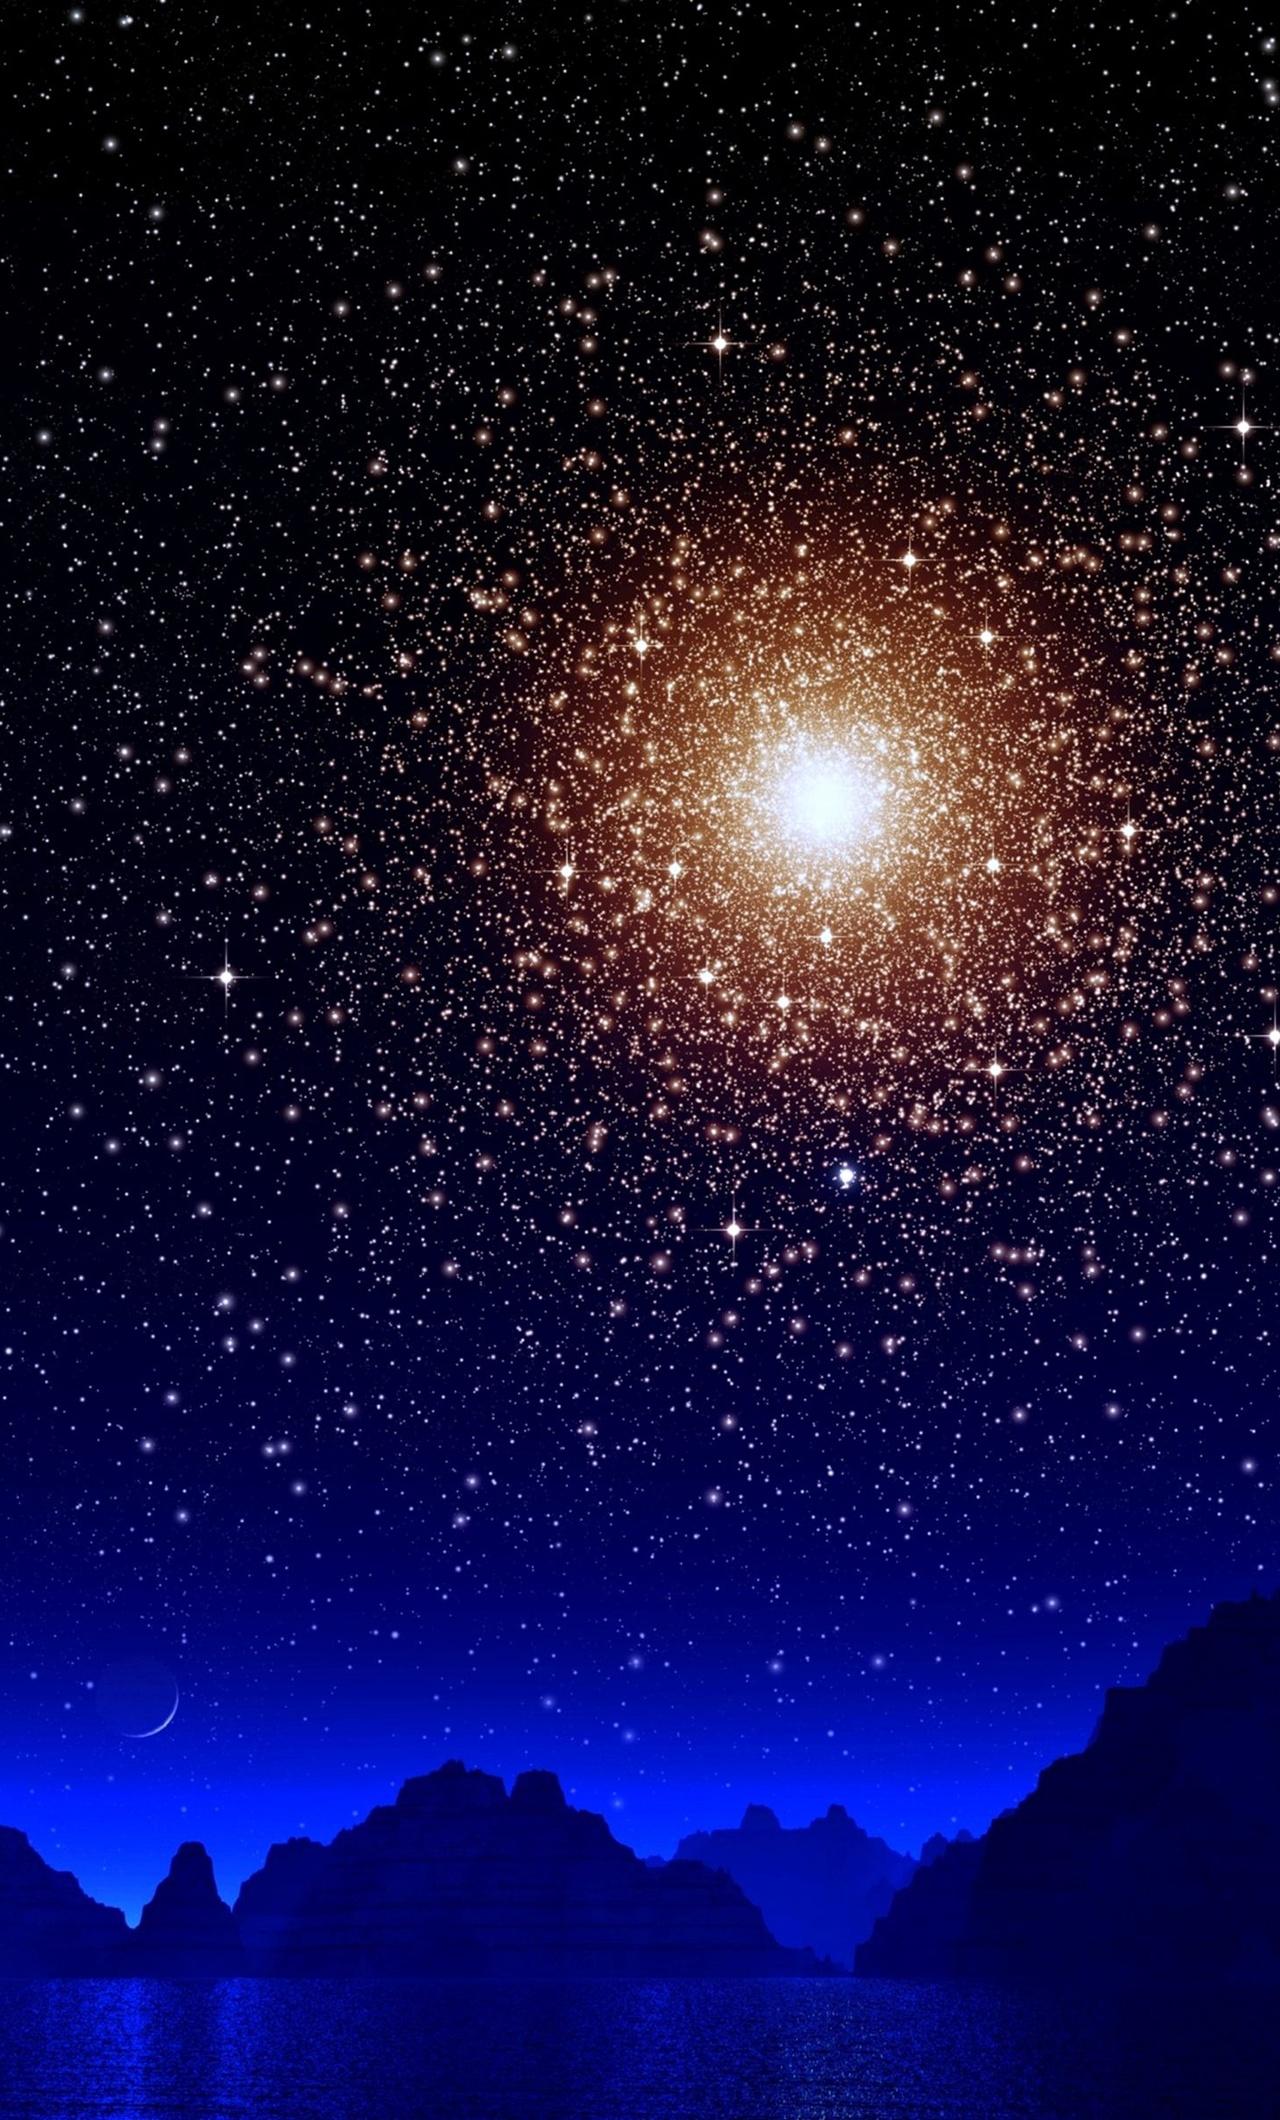 blue-night-moon-stars-earth-4k-qm.jpg